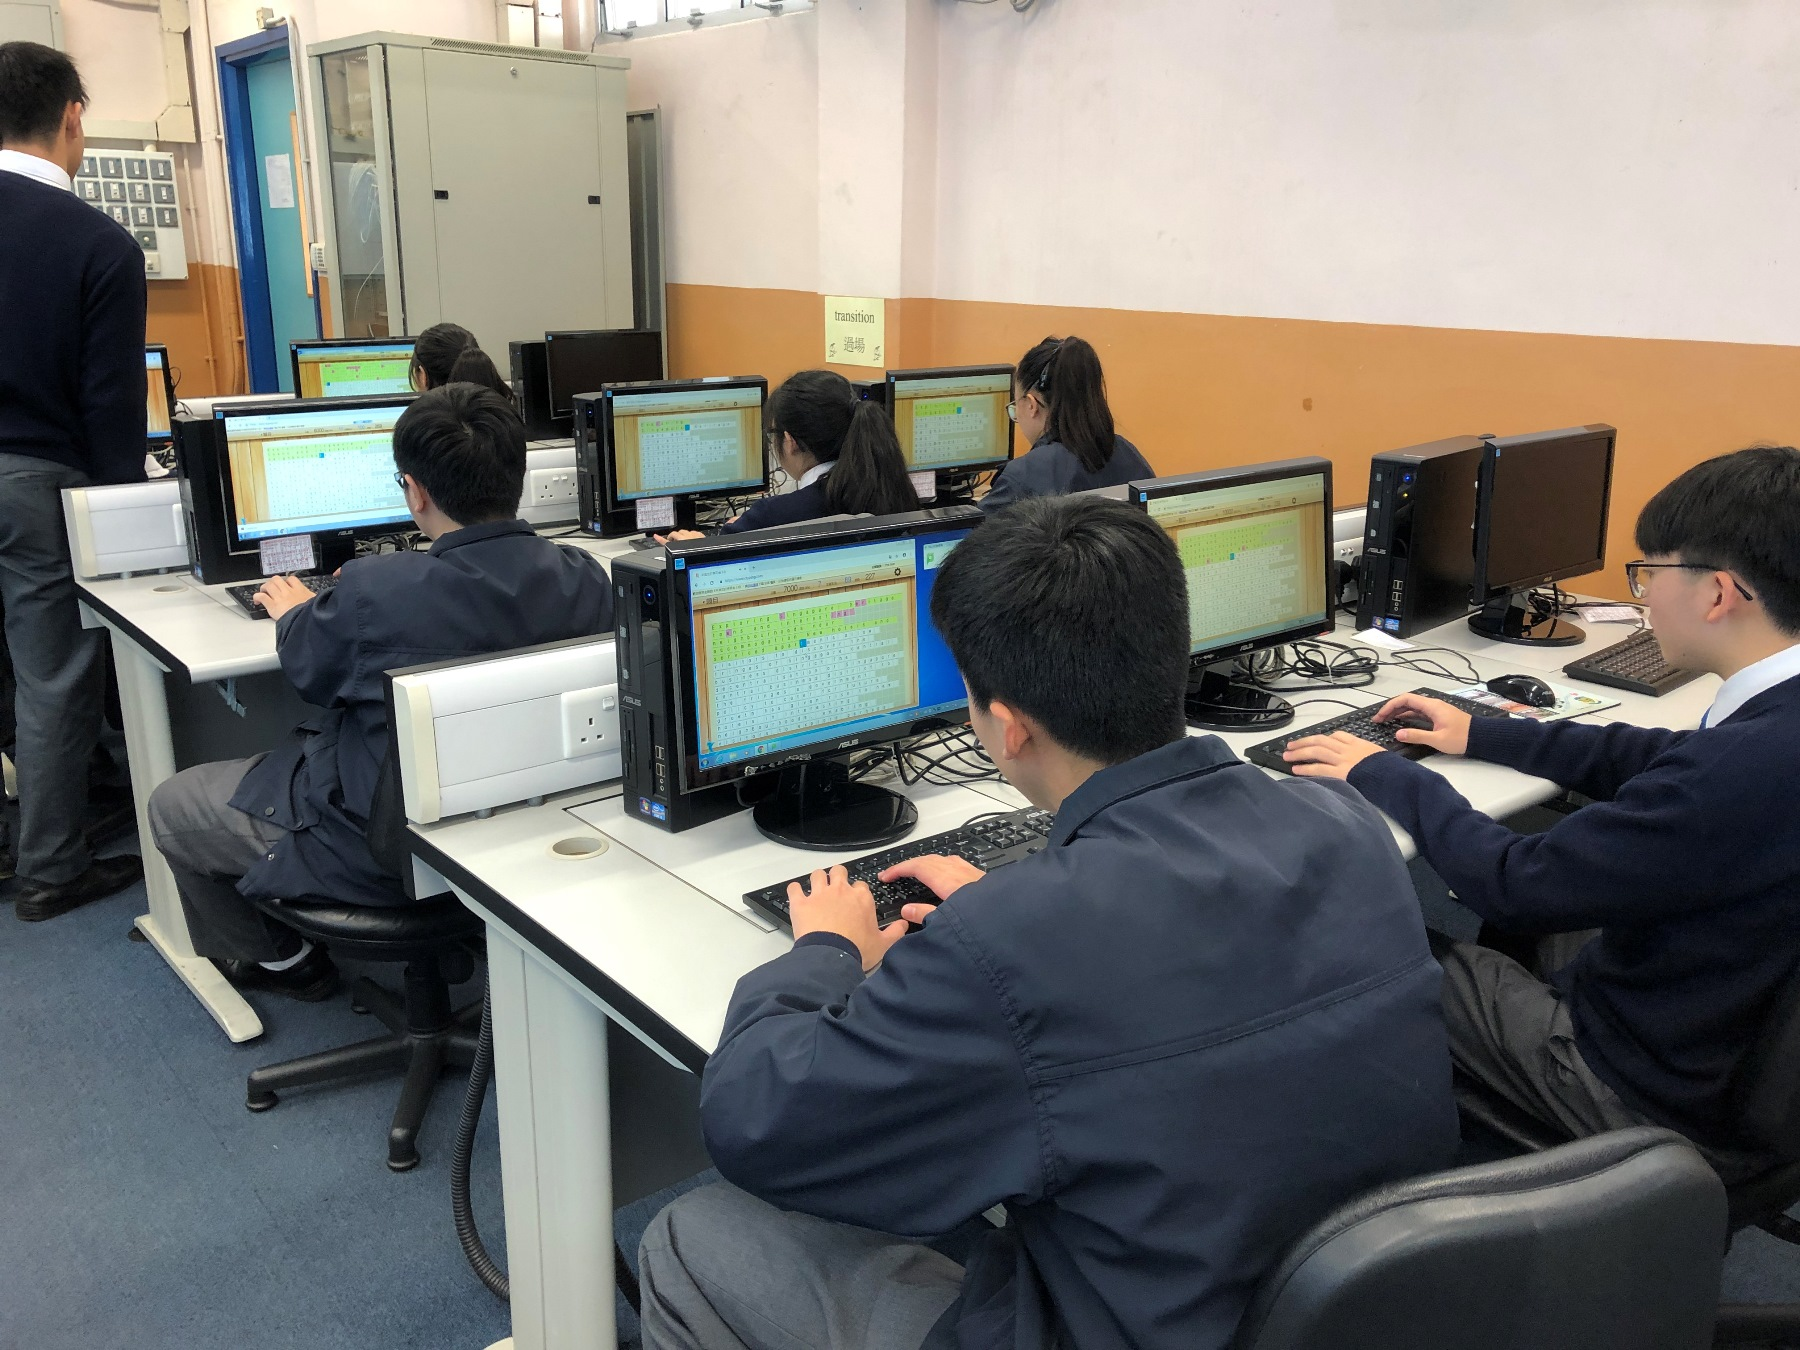 http://npc.edu.hk/sites/default/files/img_6896.jpg